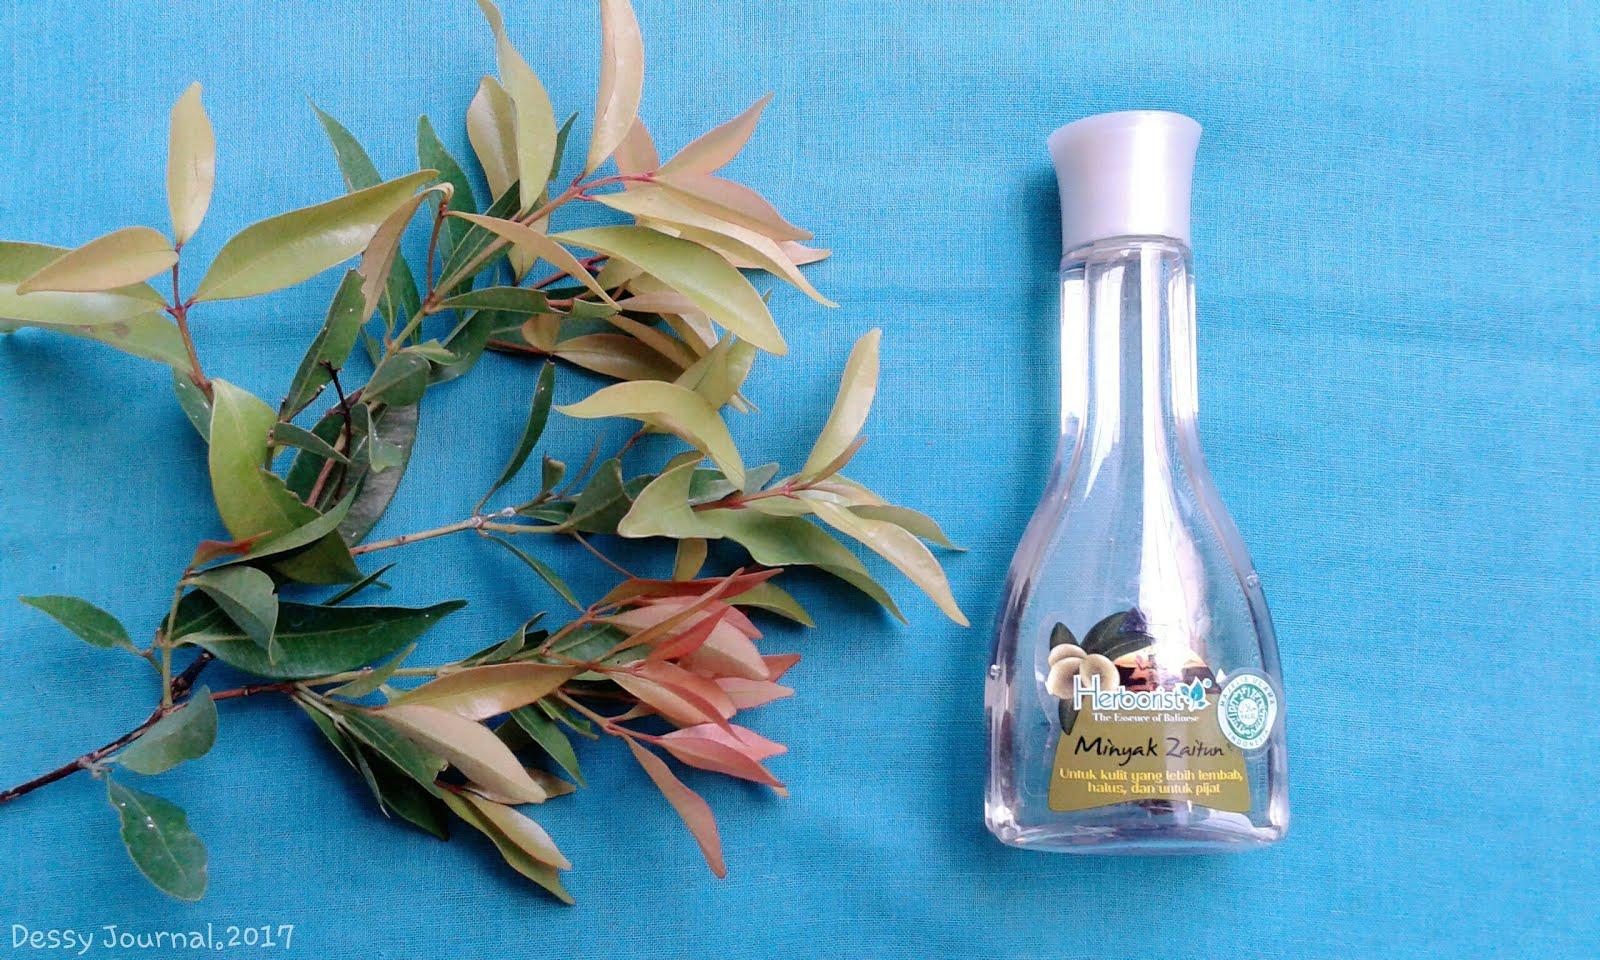 Dessy Journal Review Herborist Minyak Zaitun